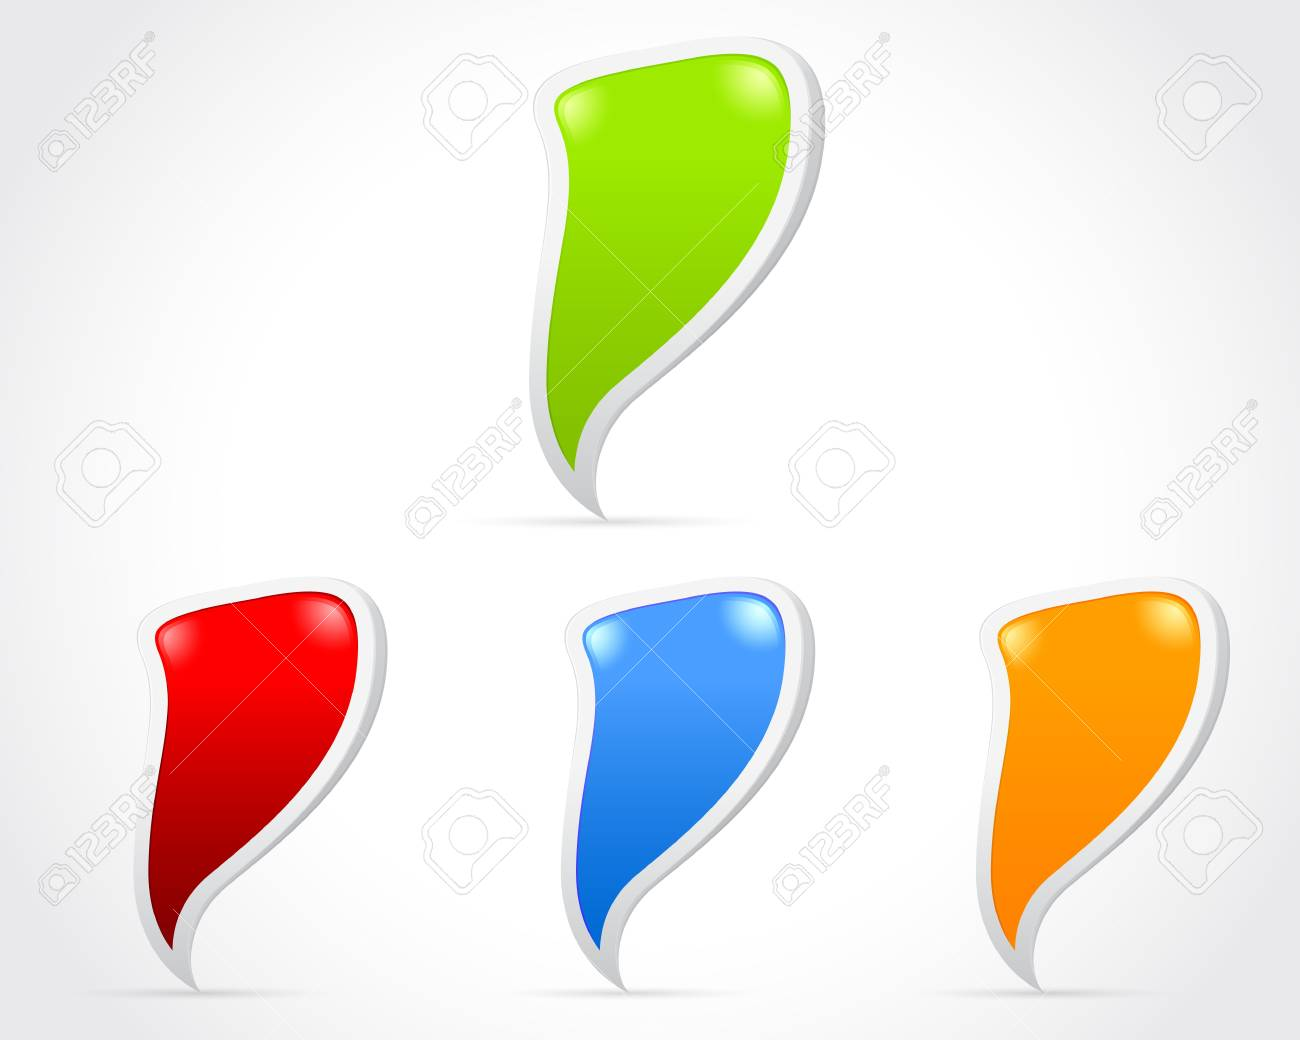 Design of messenger window icon  eps 10 Stock Vector - 13921065